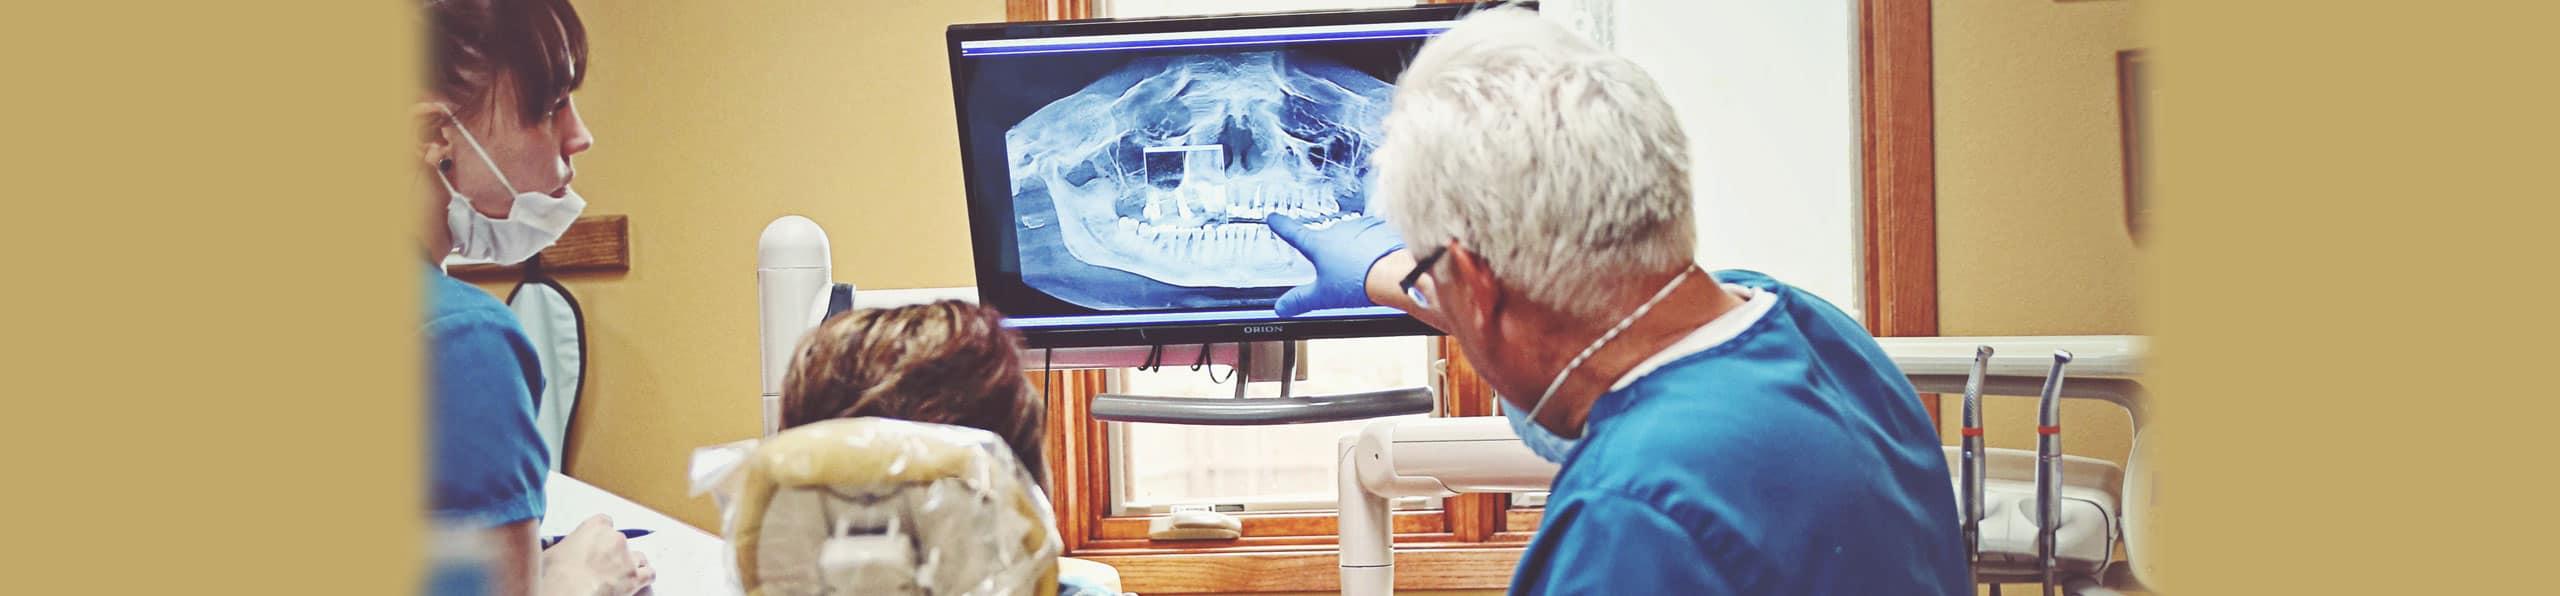 TMJ Treatment Dentistry